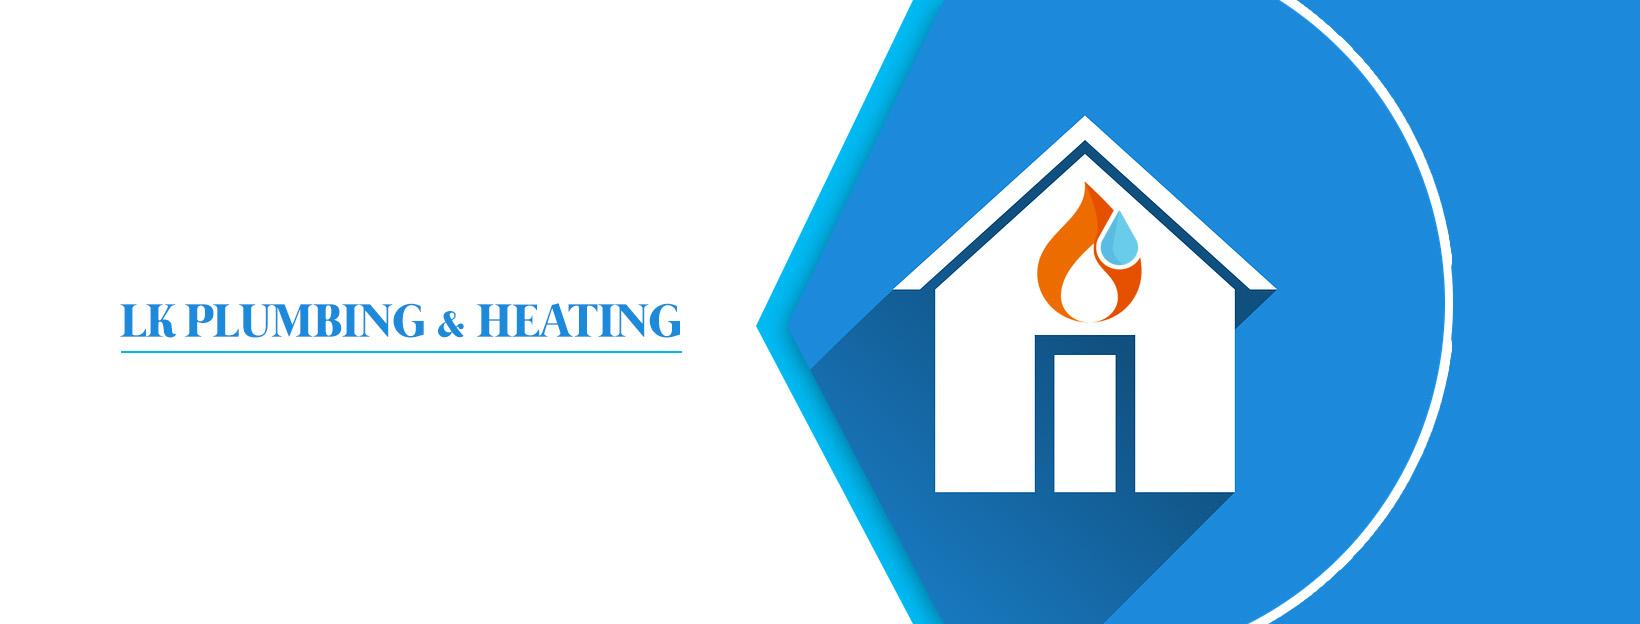 lk heating and plumbing birmingham